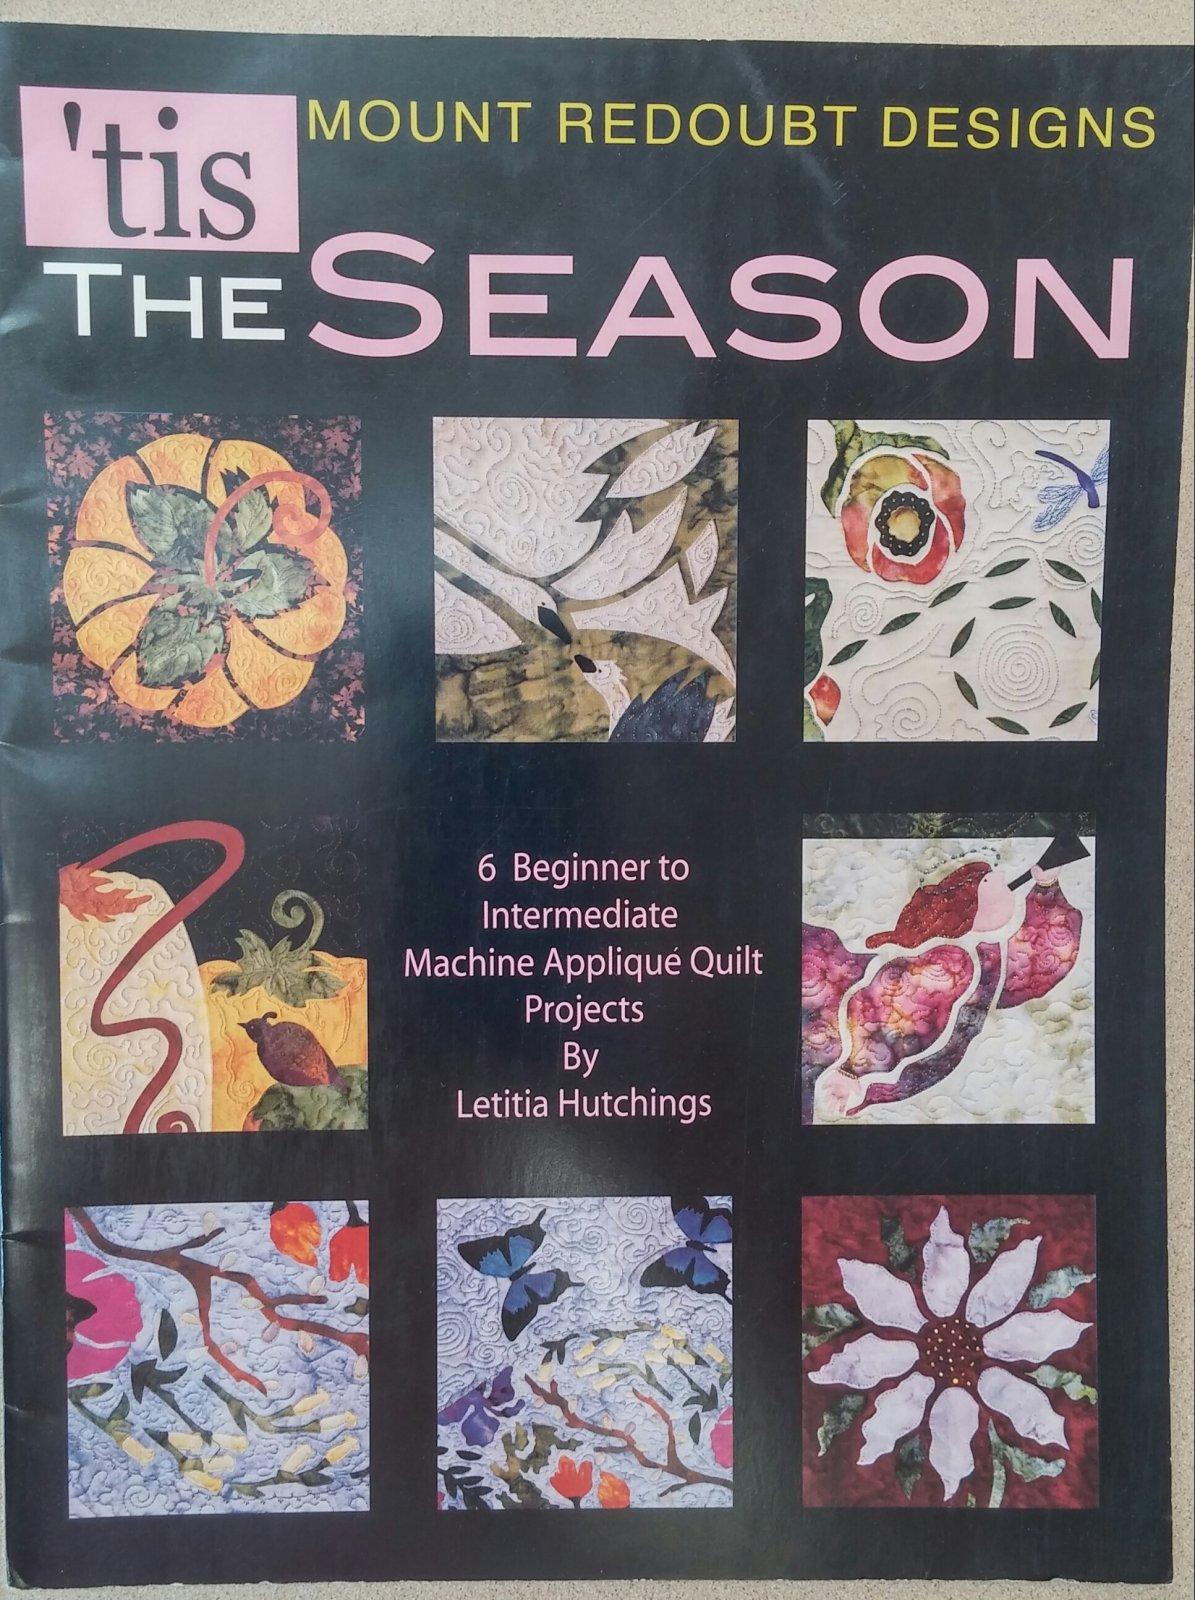 'tis The Season by Letitia Hutchings